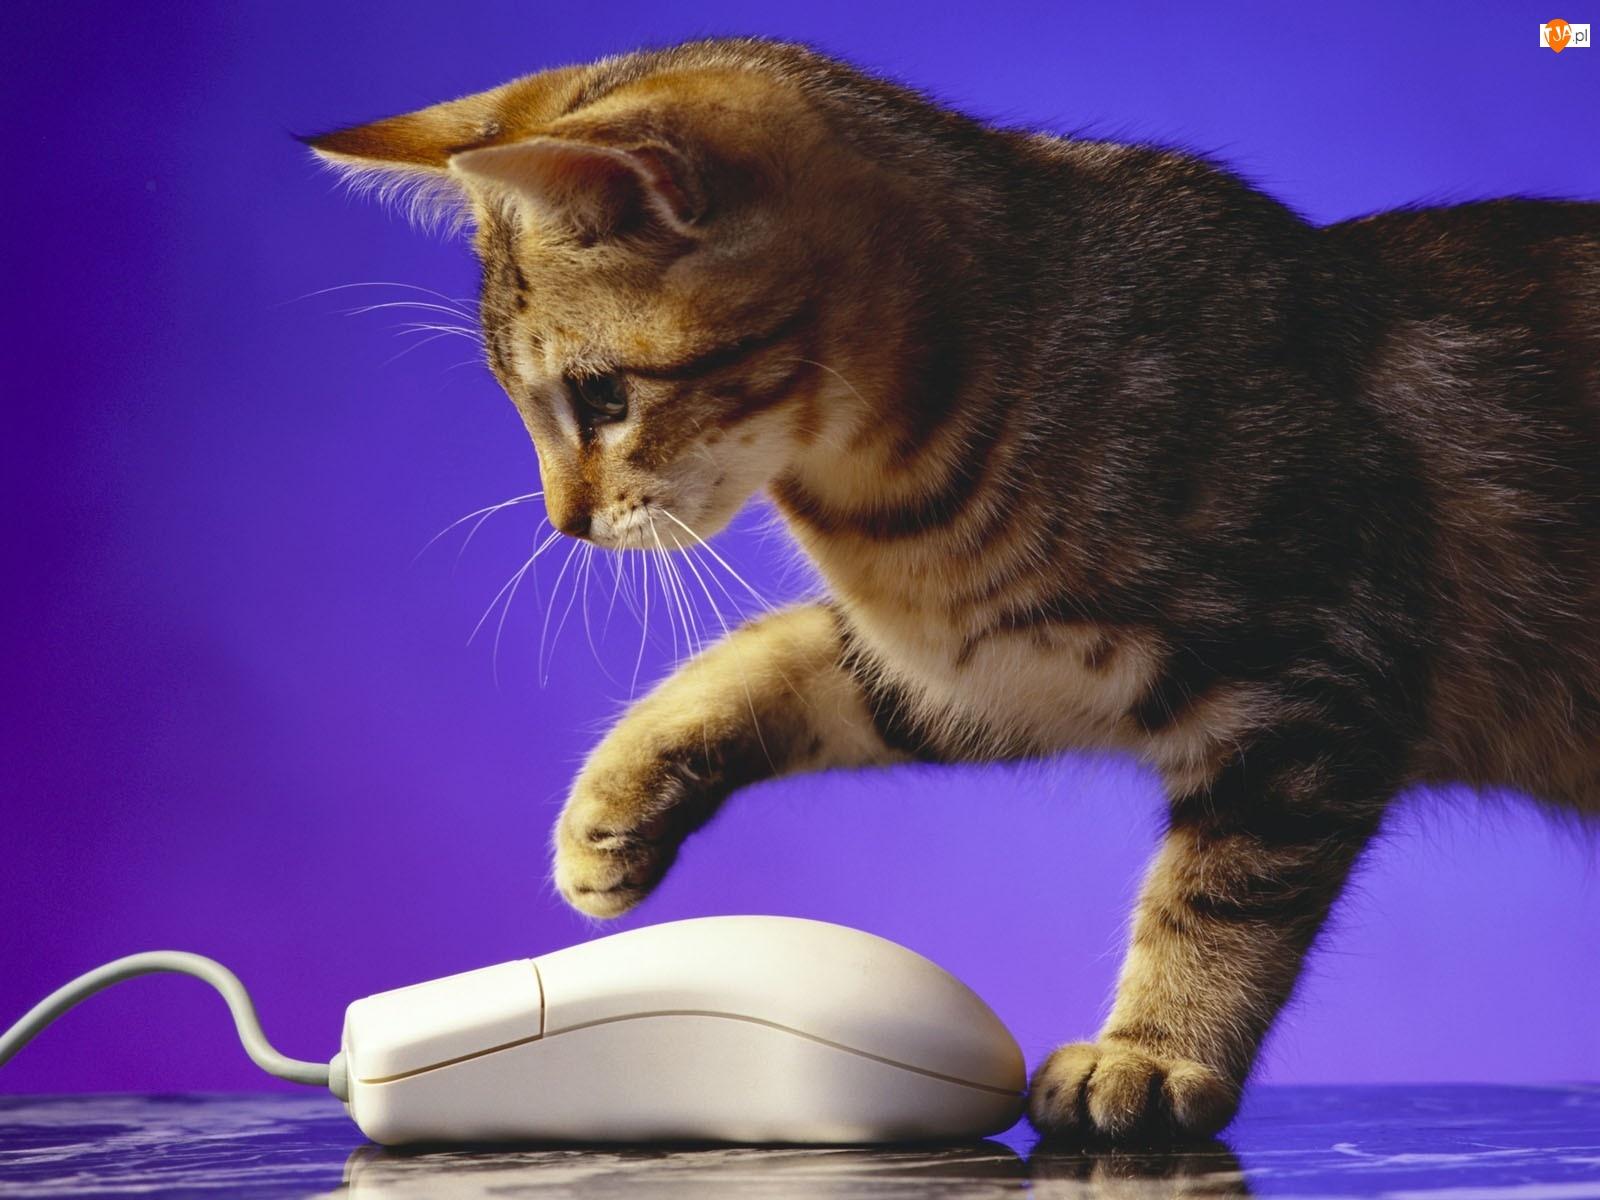 Komputerowa, Kotek, Mysz